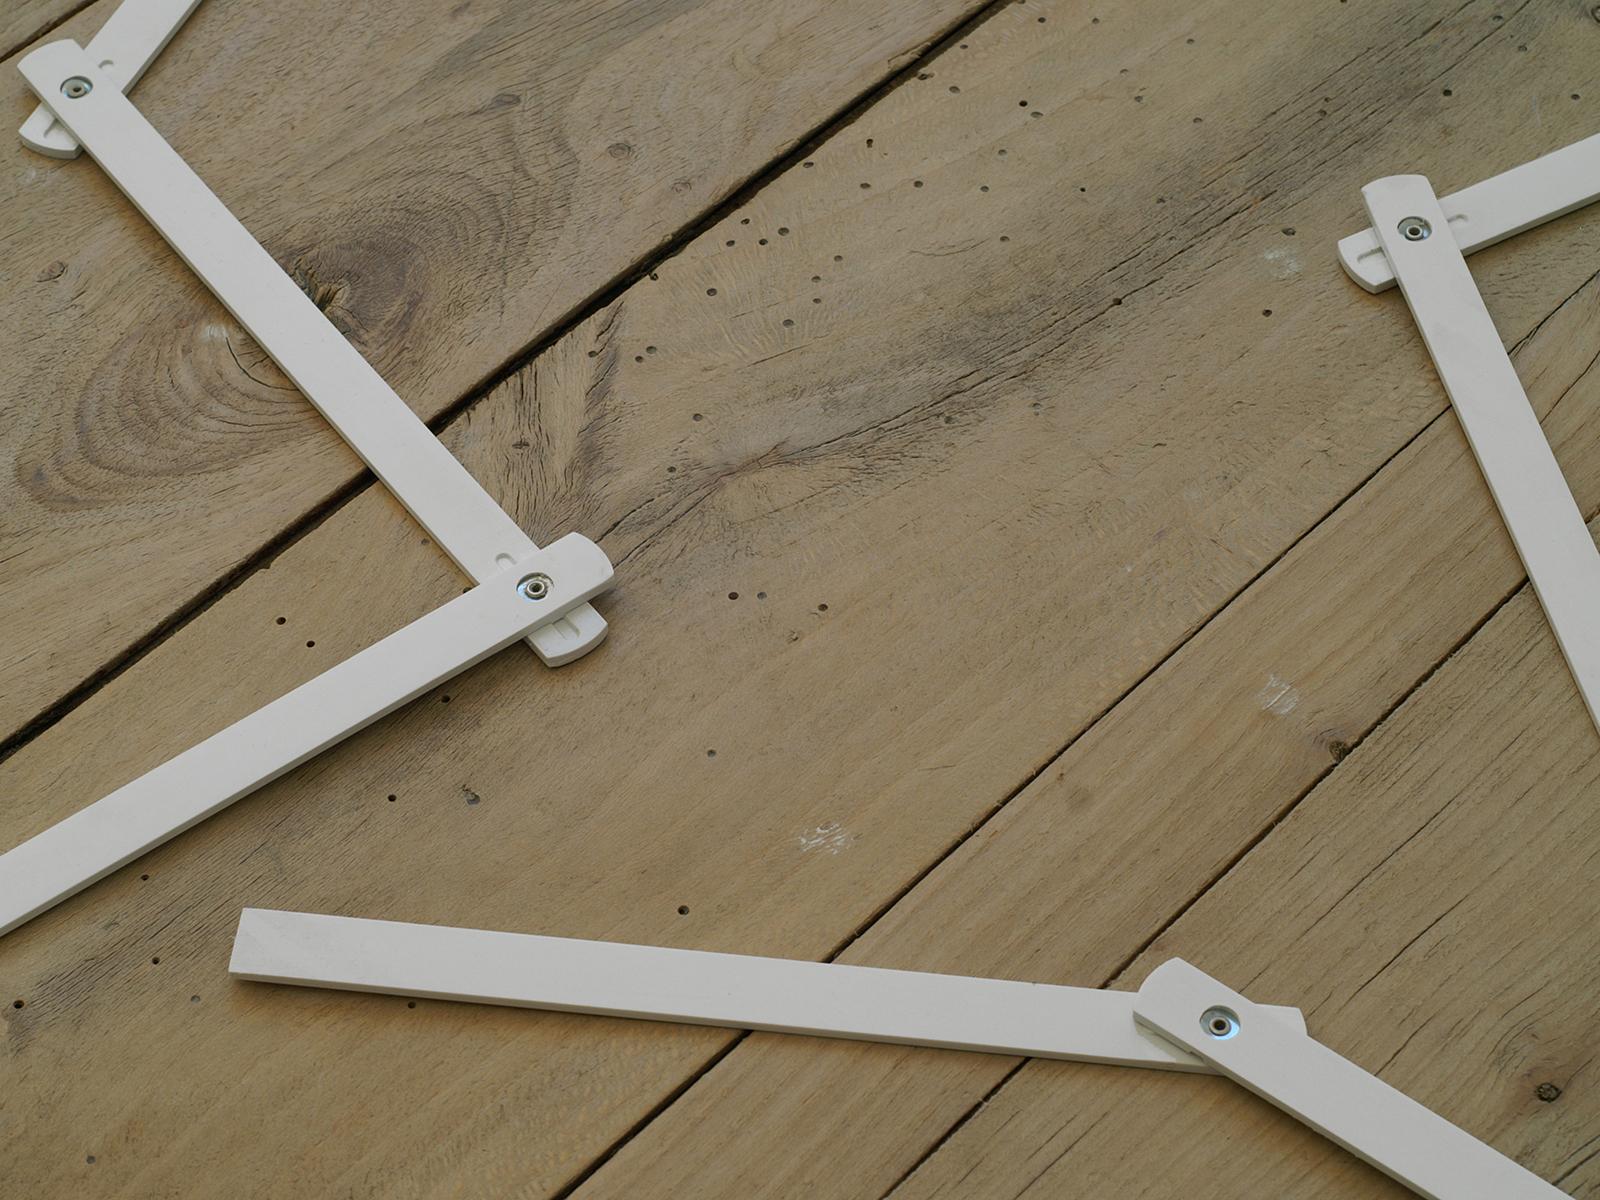 Benoit-Delaunay-artiste-sculptures-2010-asterism-11.jpg